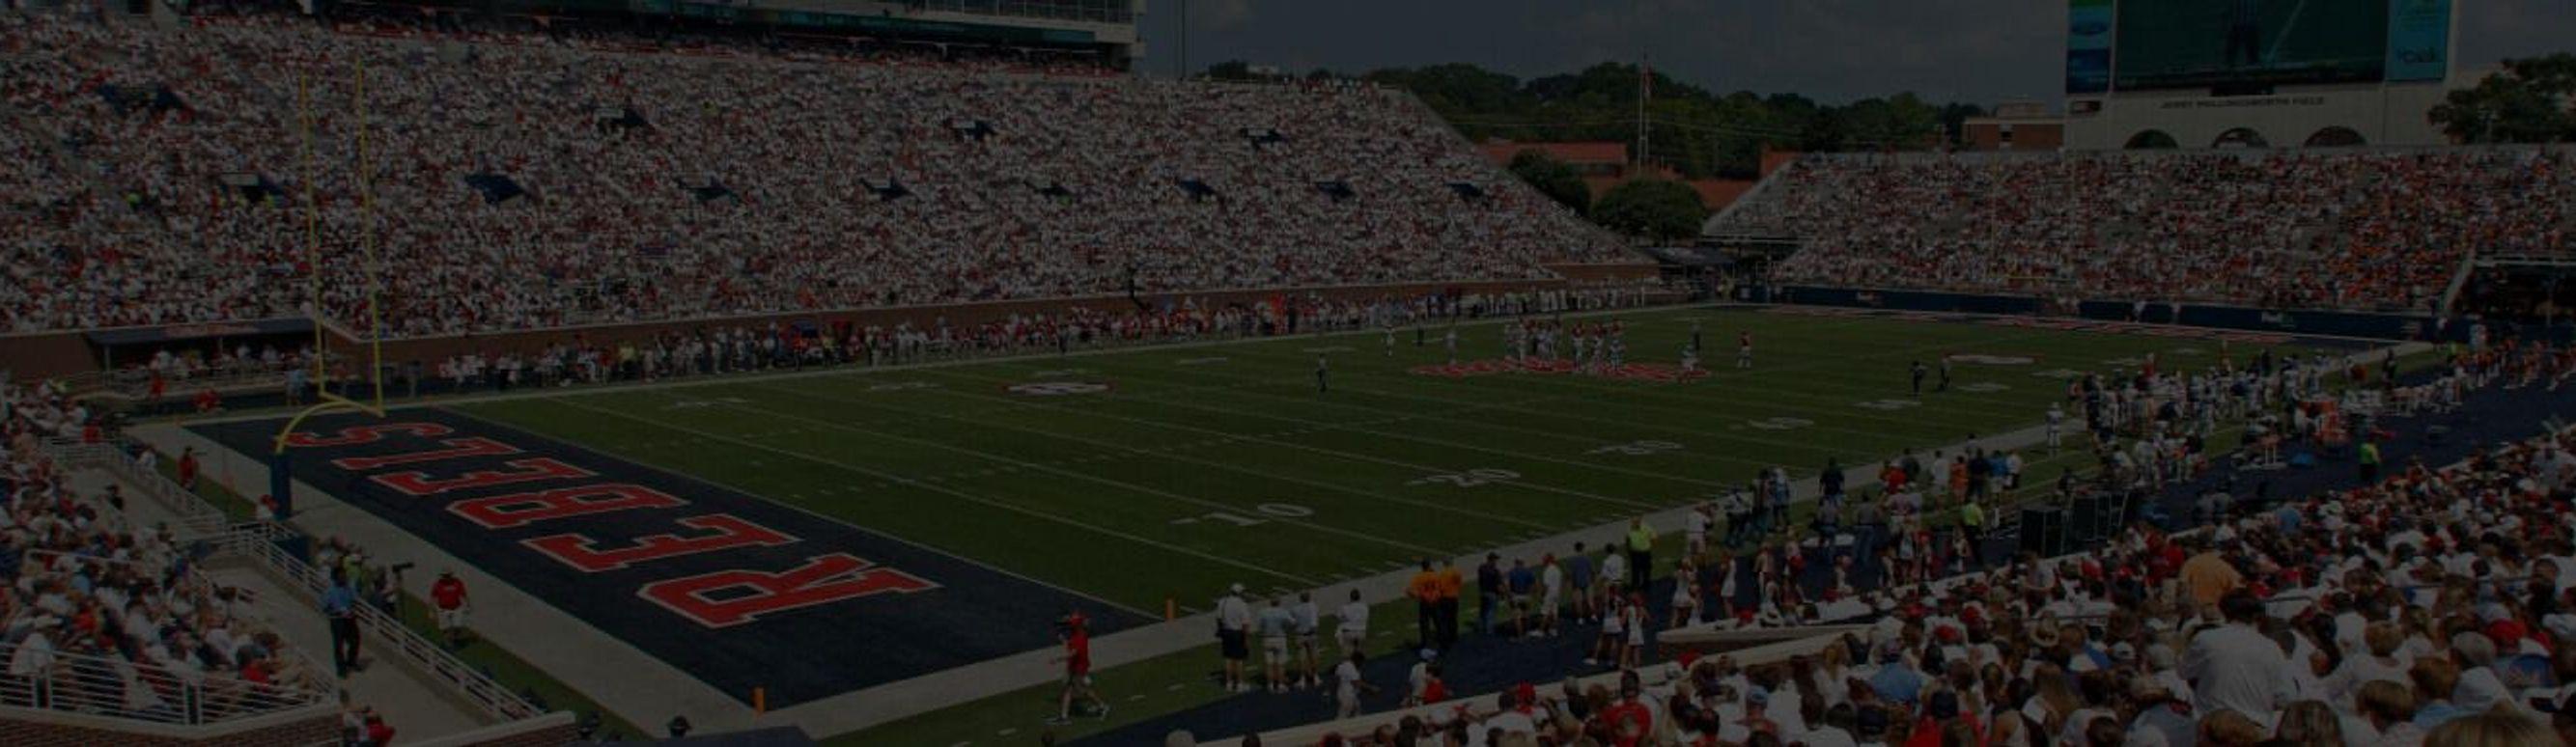 Vaught-Hemingway Stadium in Oxford, Mississippi.